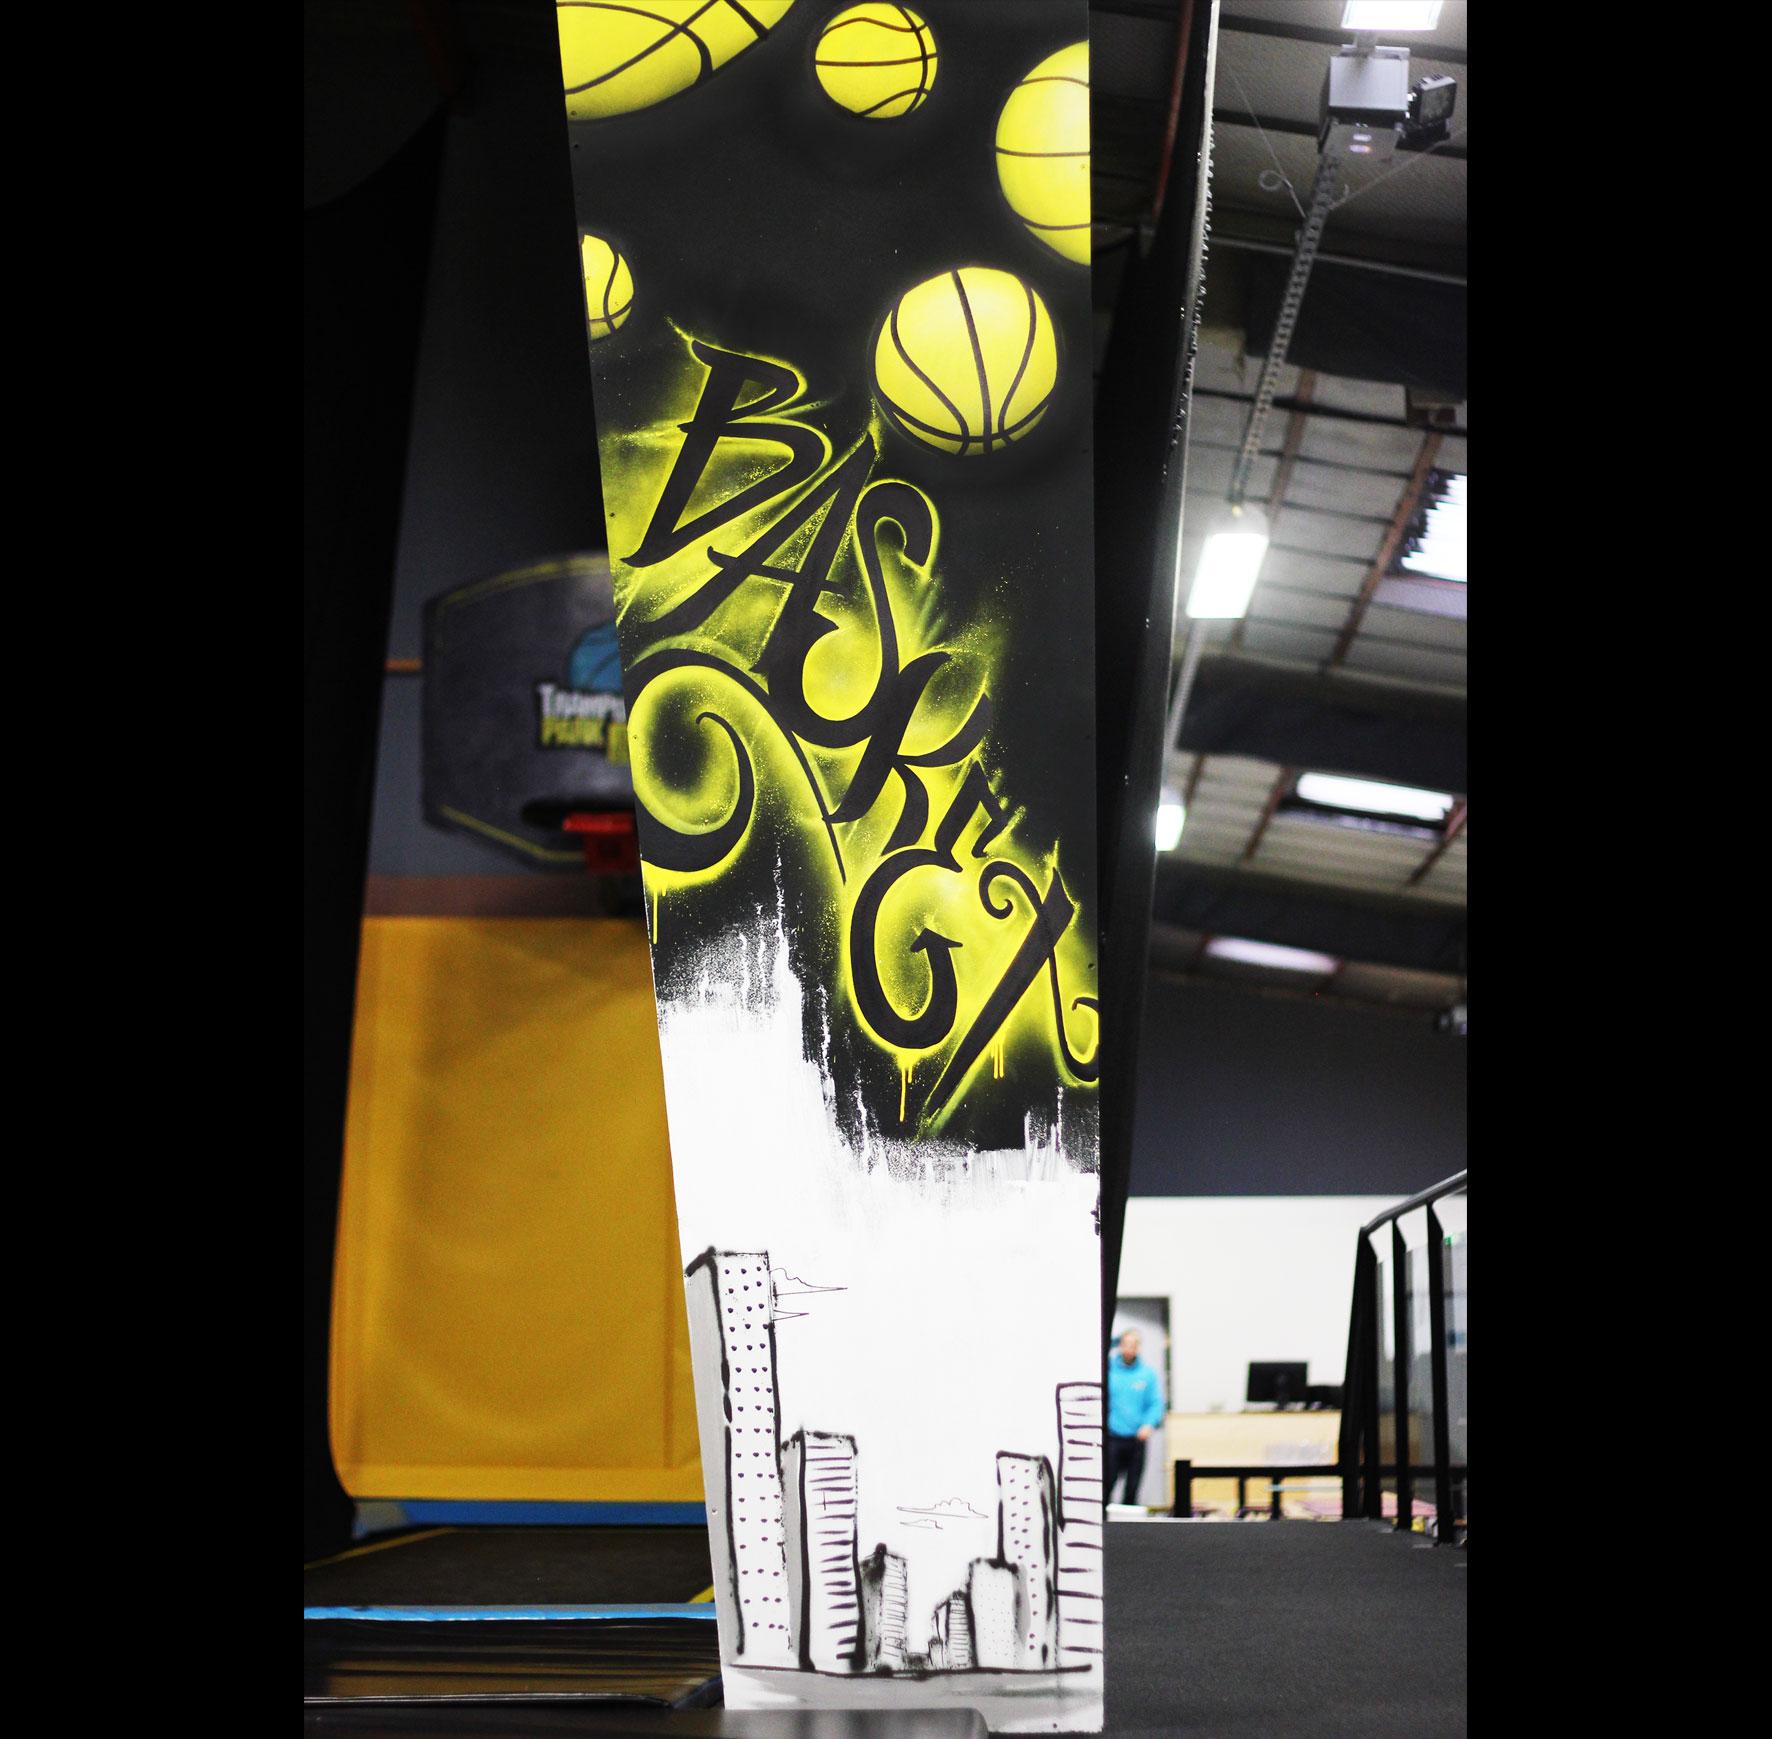 Colonne graffiti basketball street art